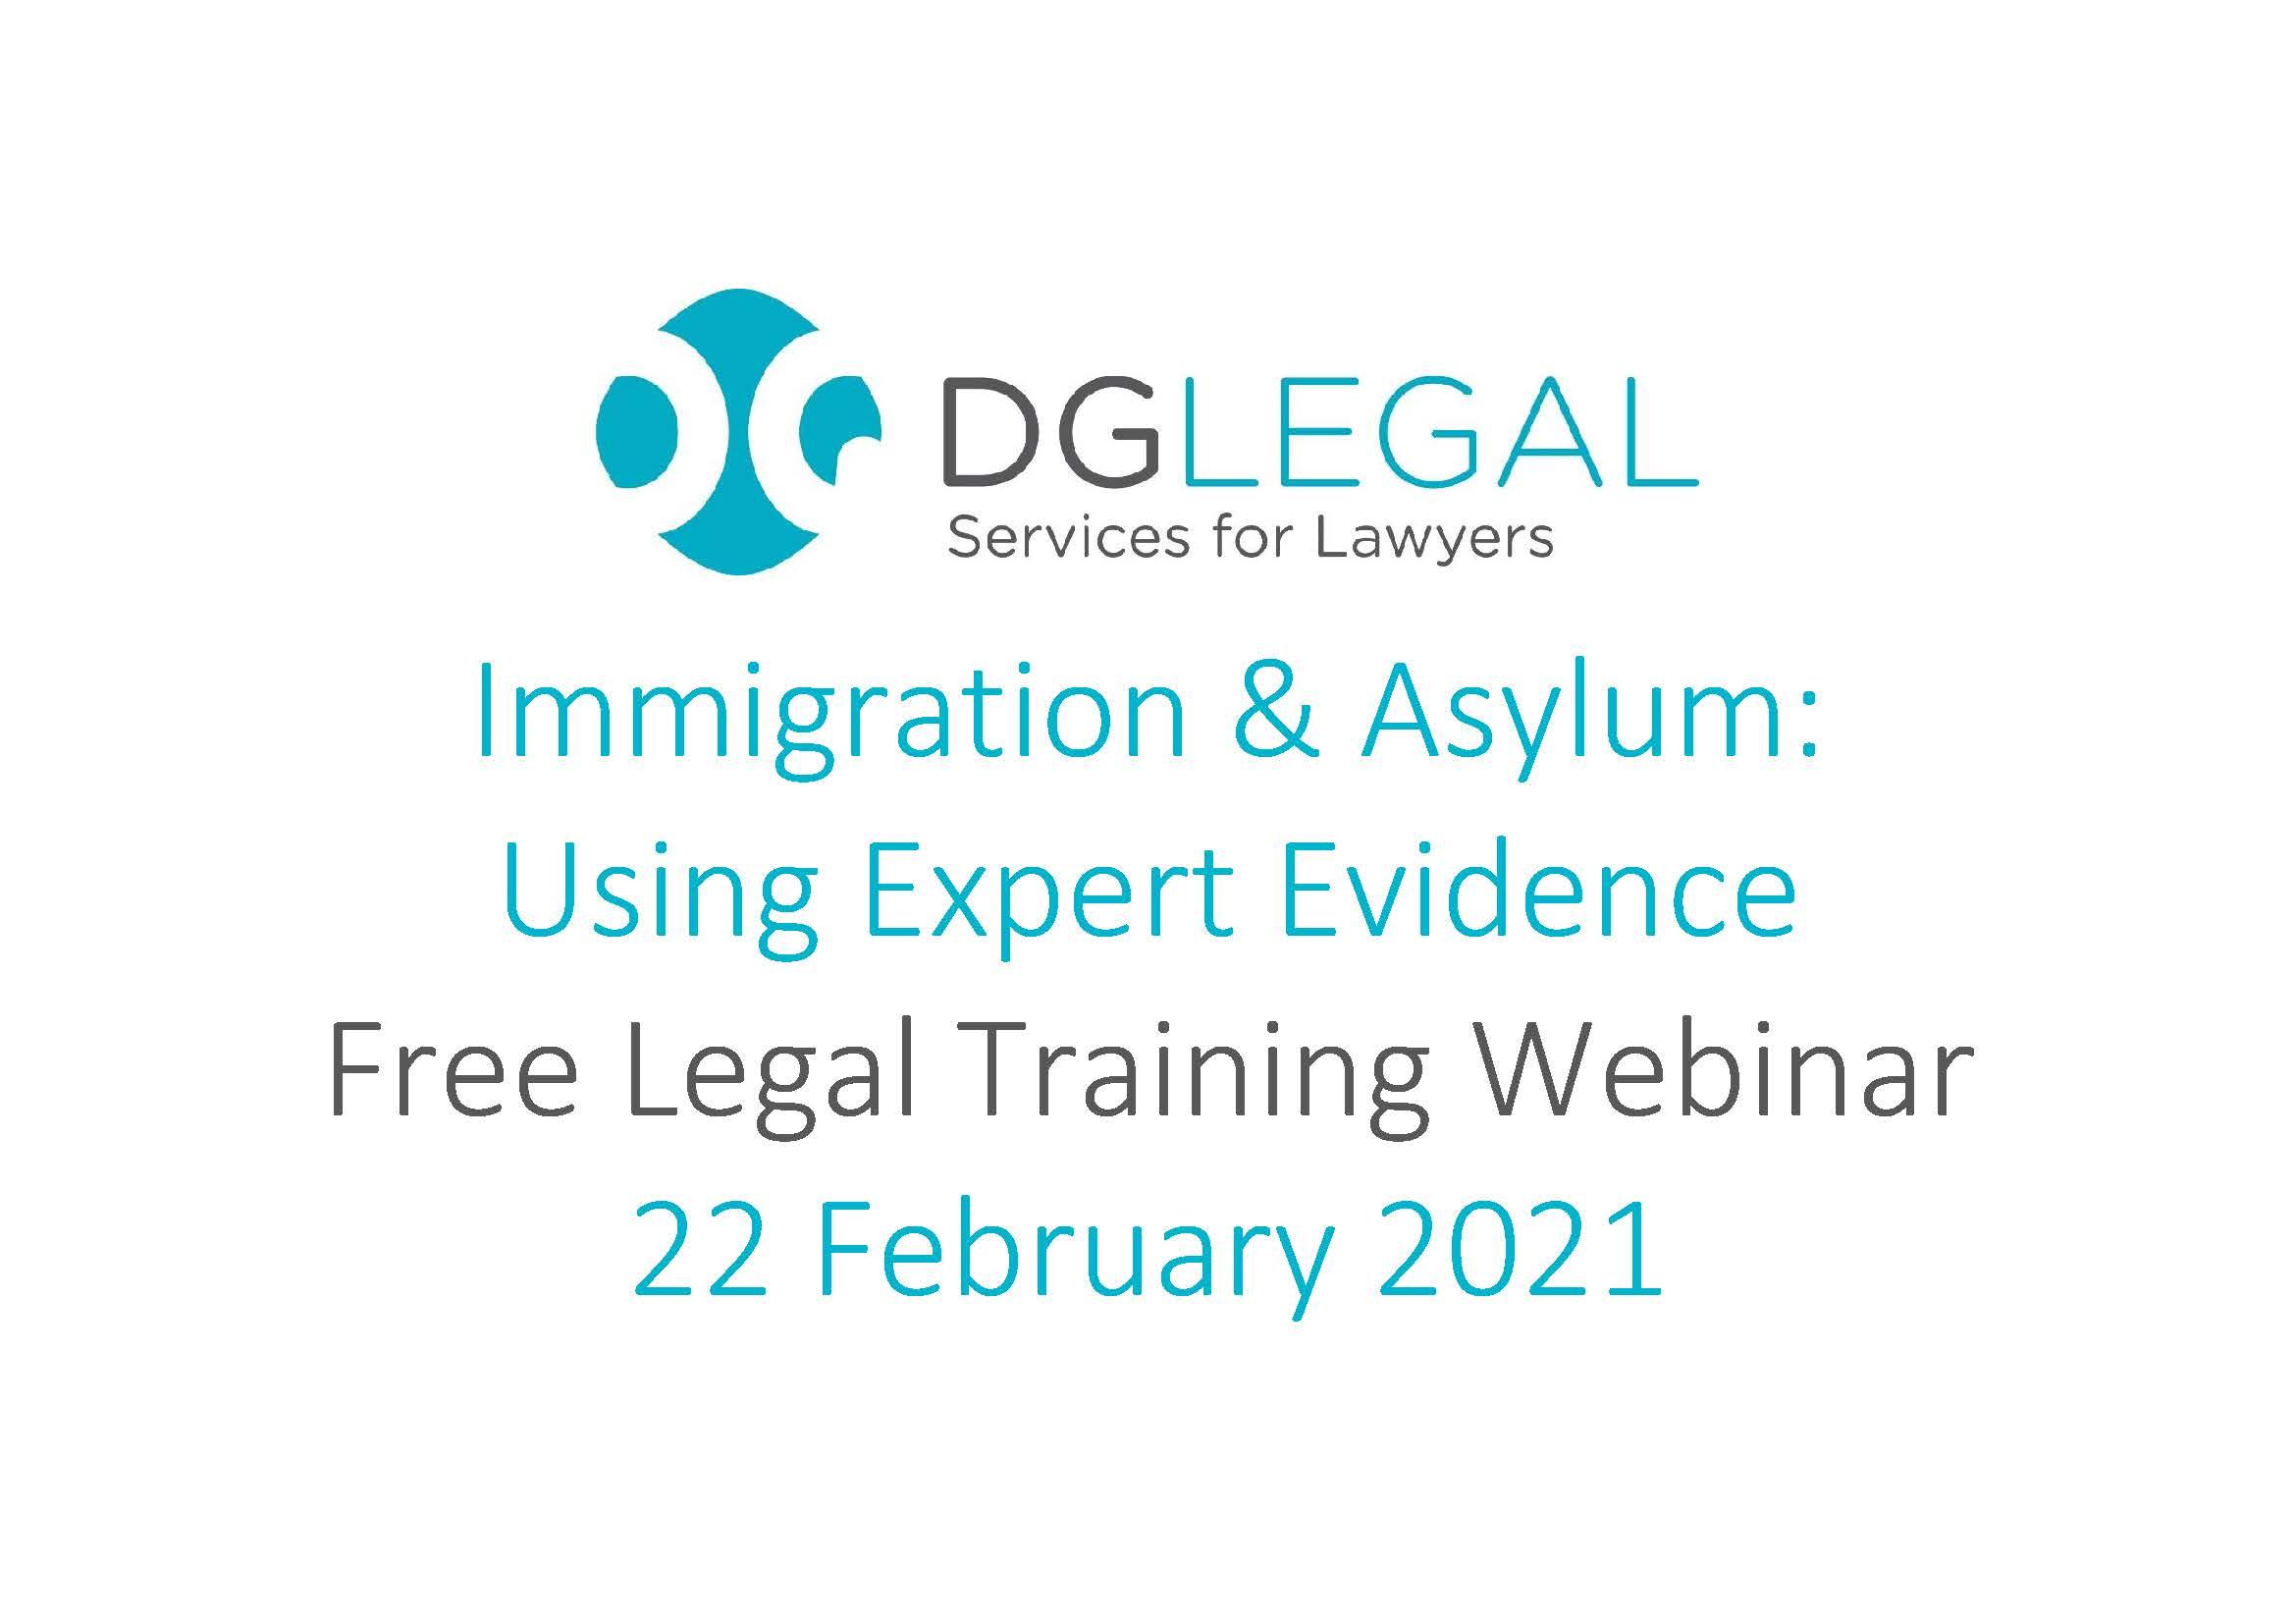 Immigration & Asylum Using Expert Evidence